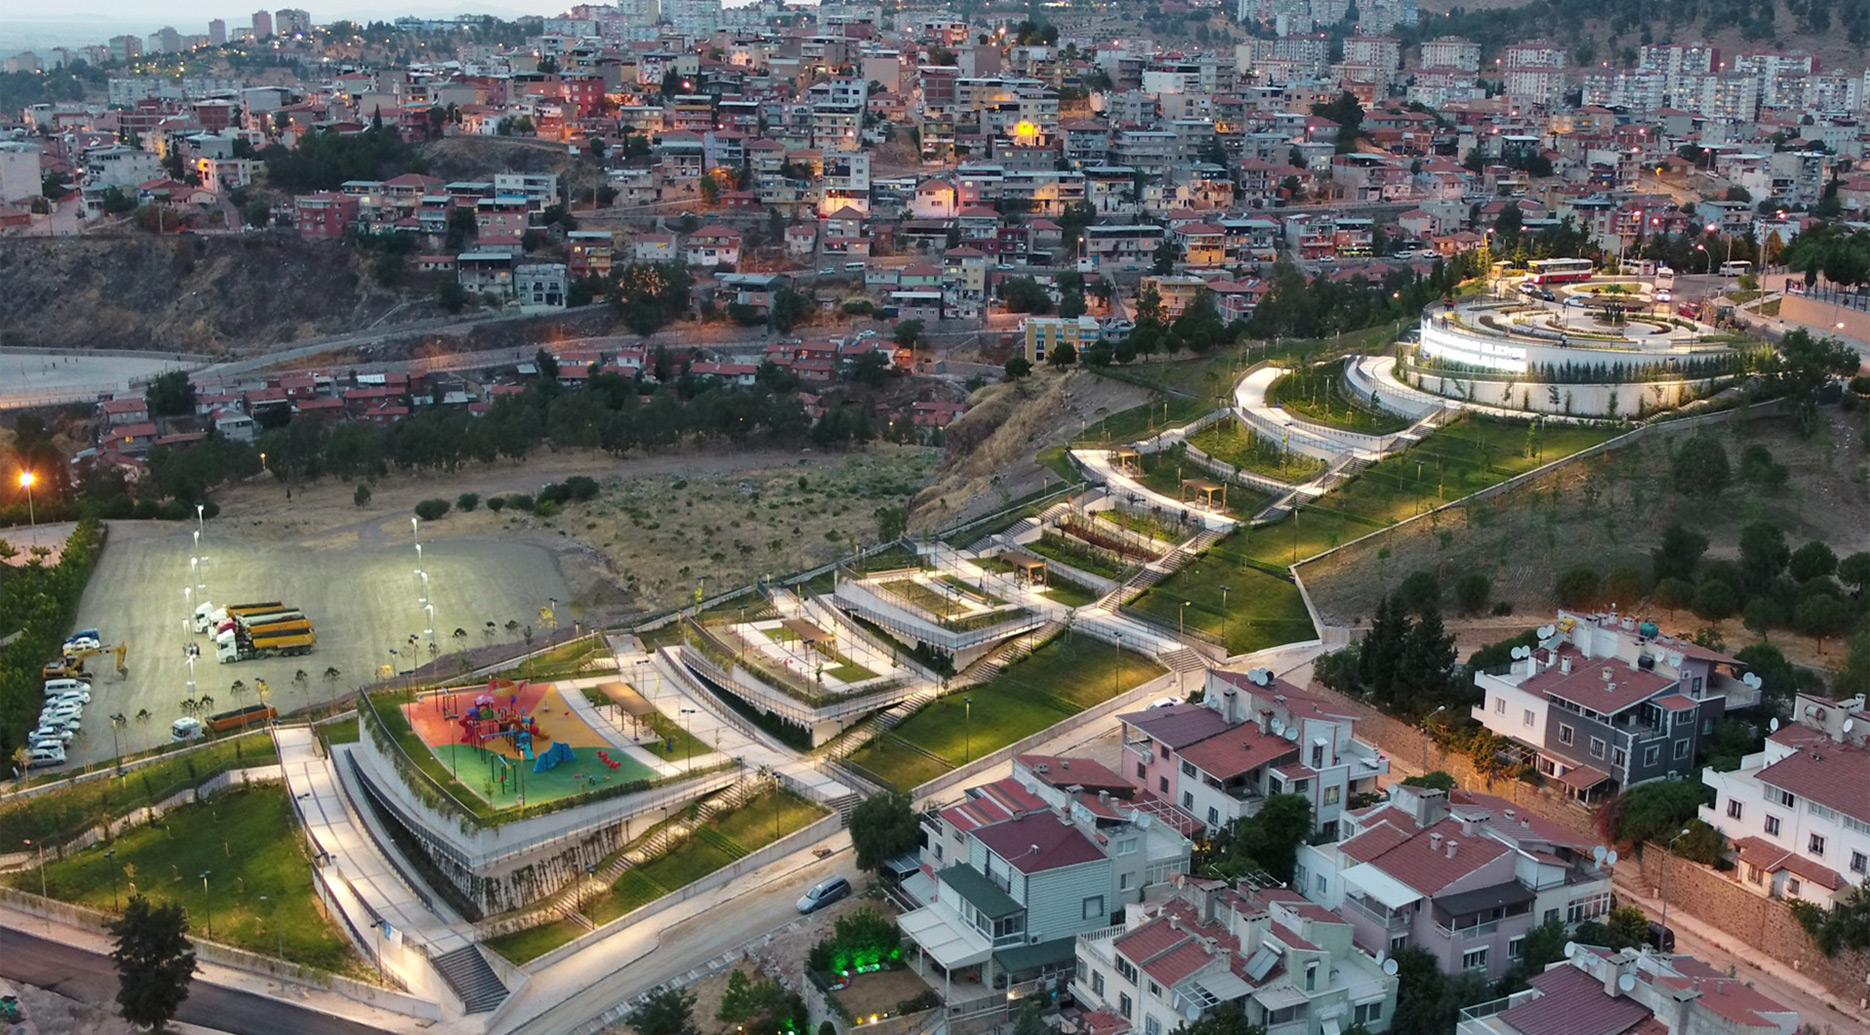 AHMET TANER KIŞLALI PARKI YAPIMI 228